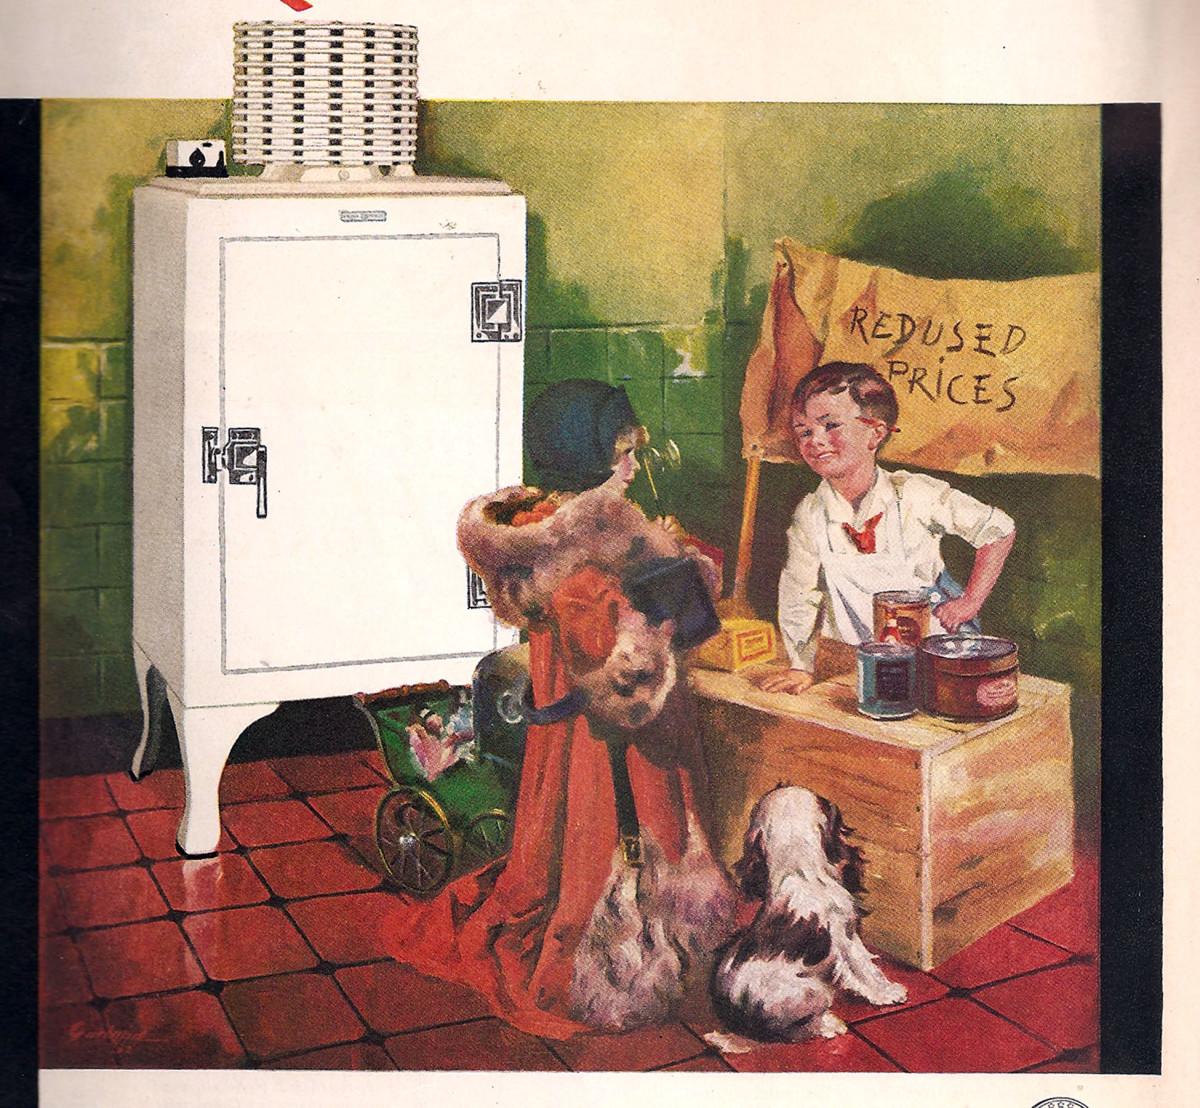 Vintage Kitchen Appliances Of The 1930s Dengarden